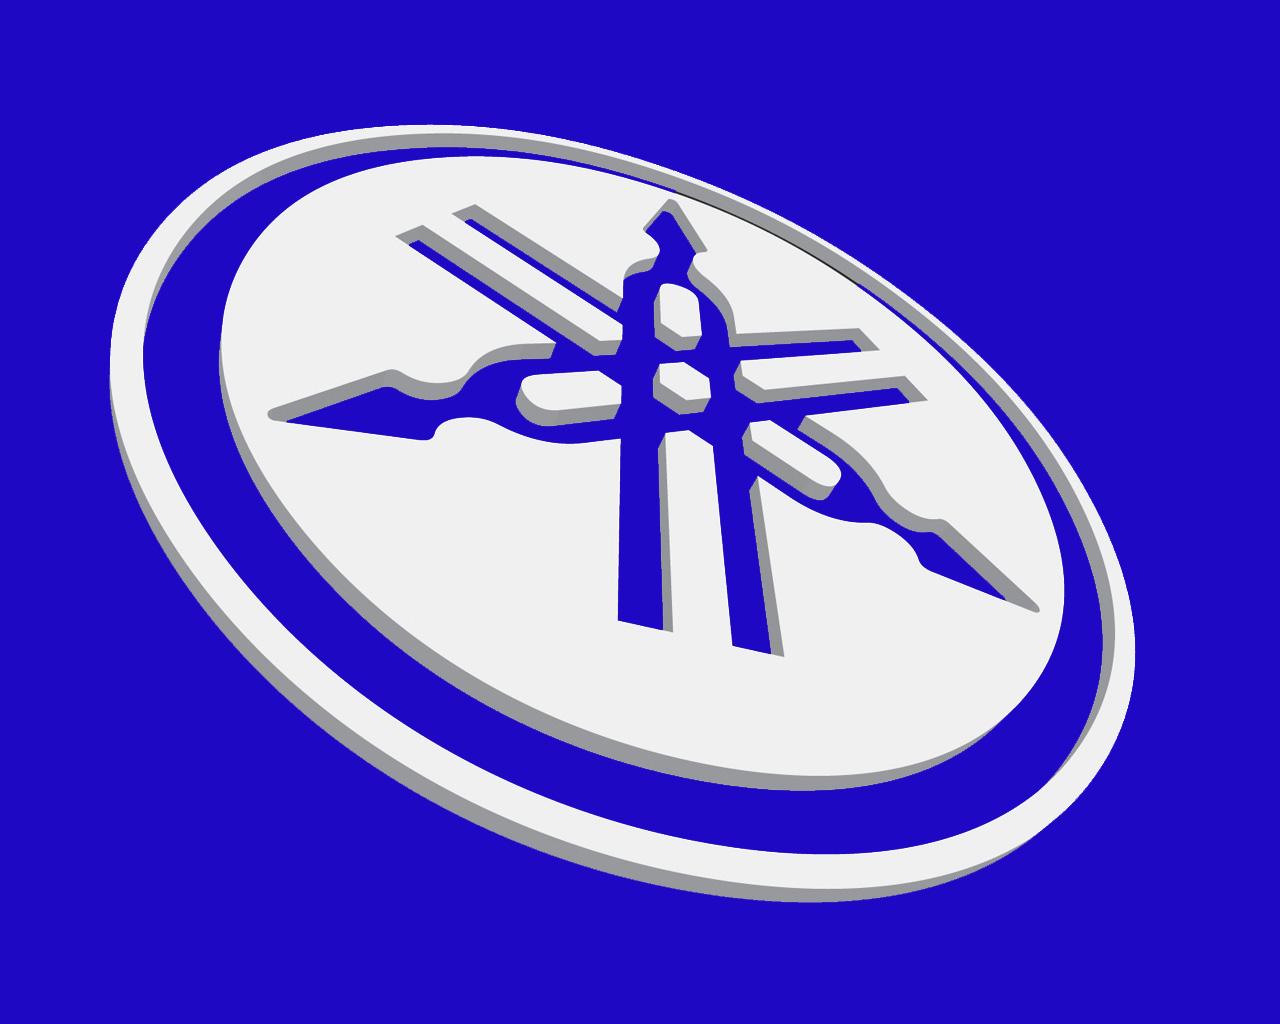 Yamaha Logo Wallpaper Runicfin Deviantart Quotekocom 1280x1024